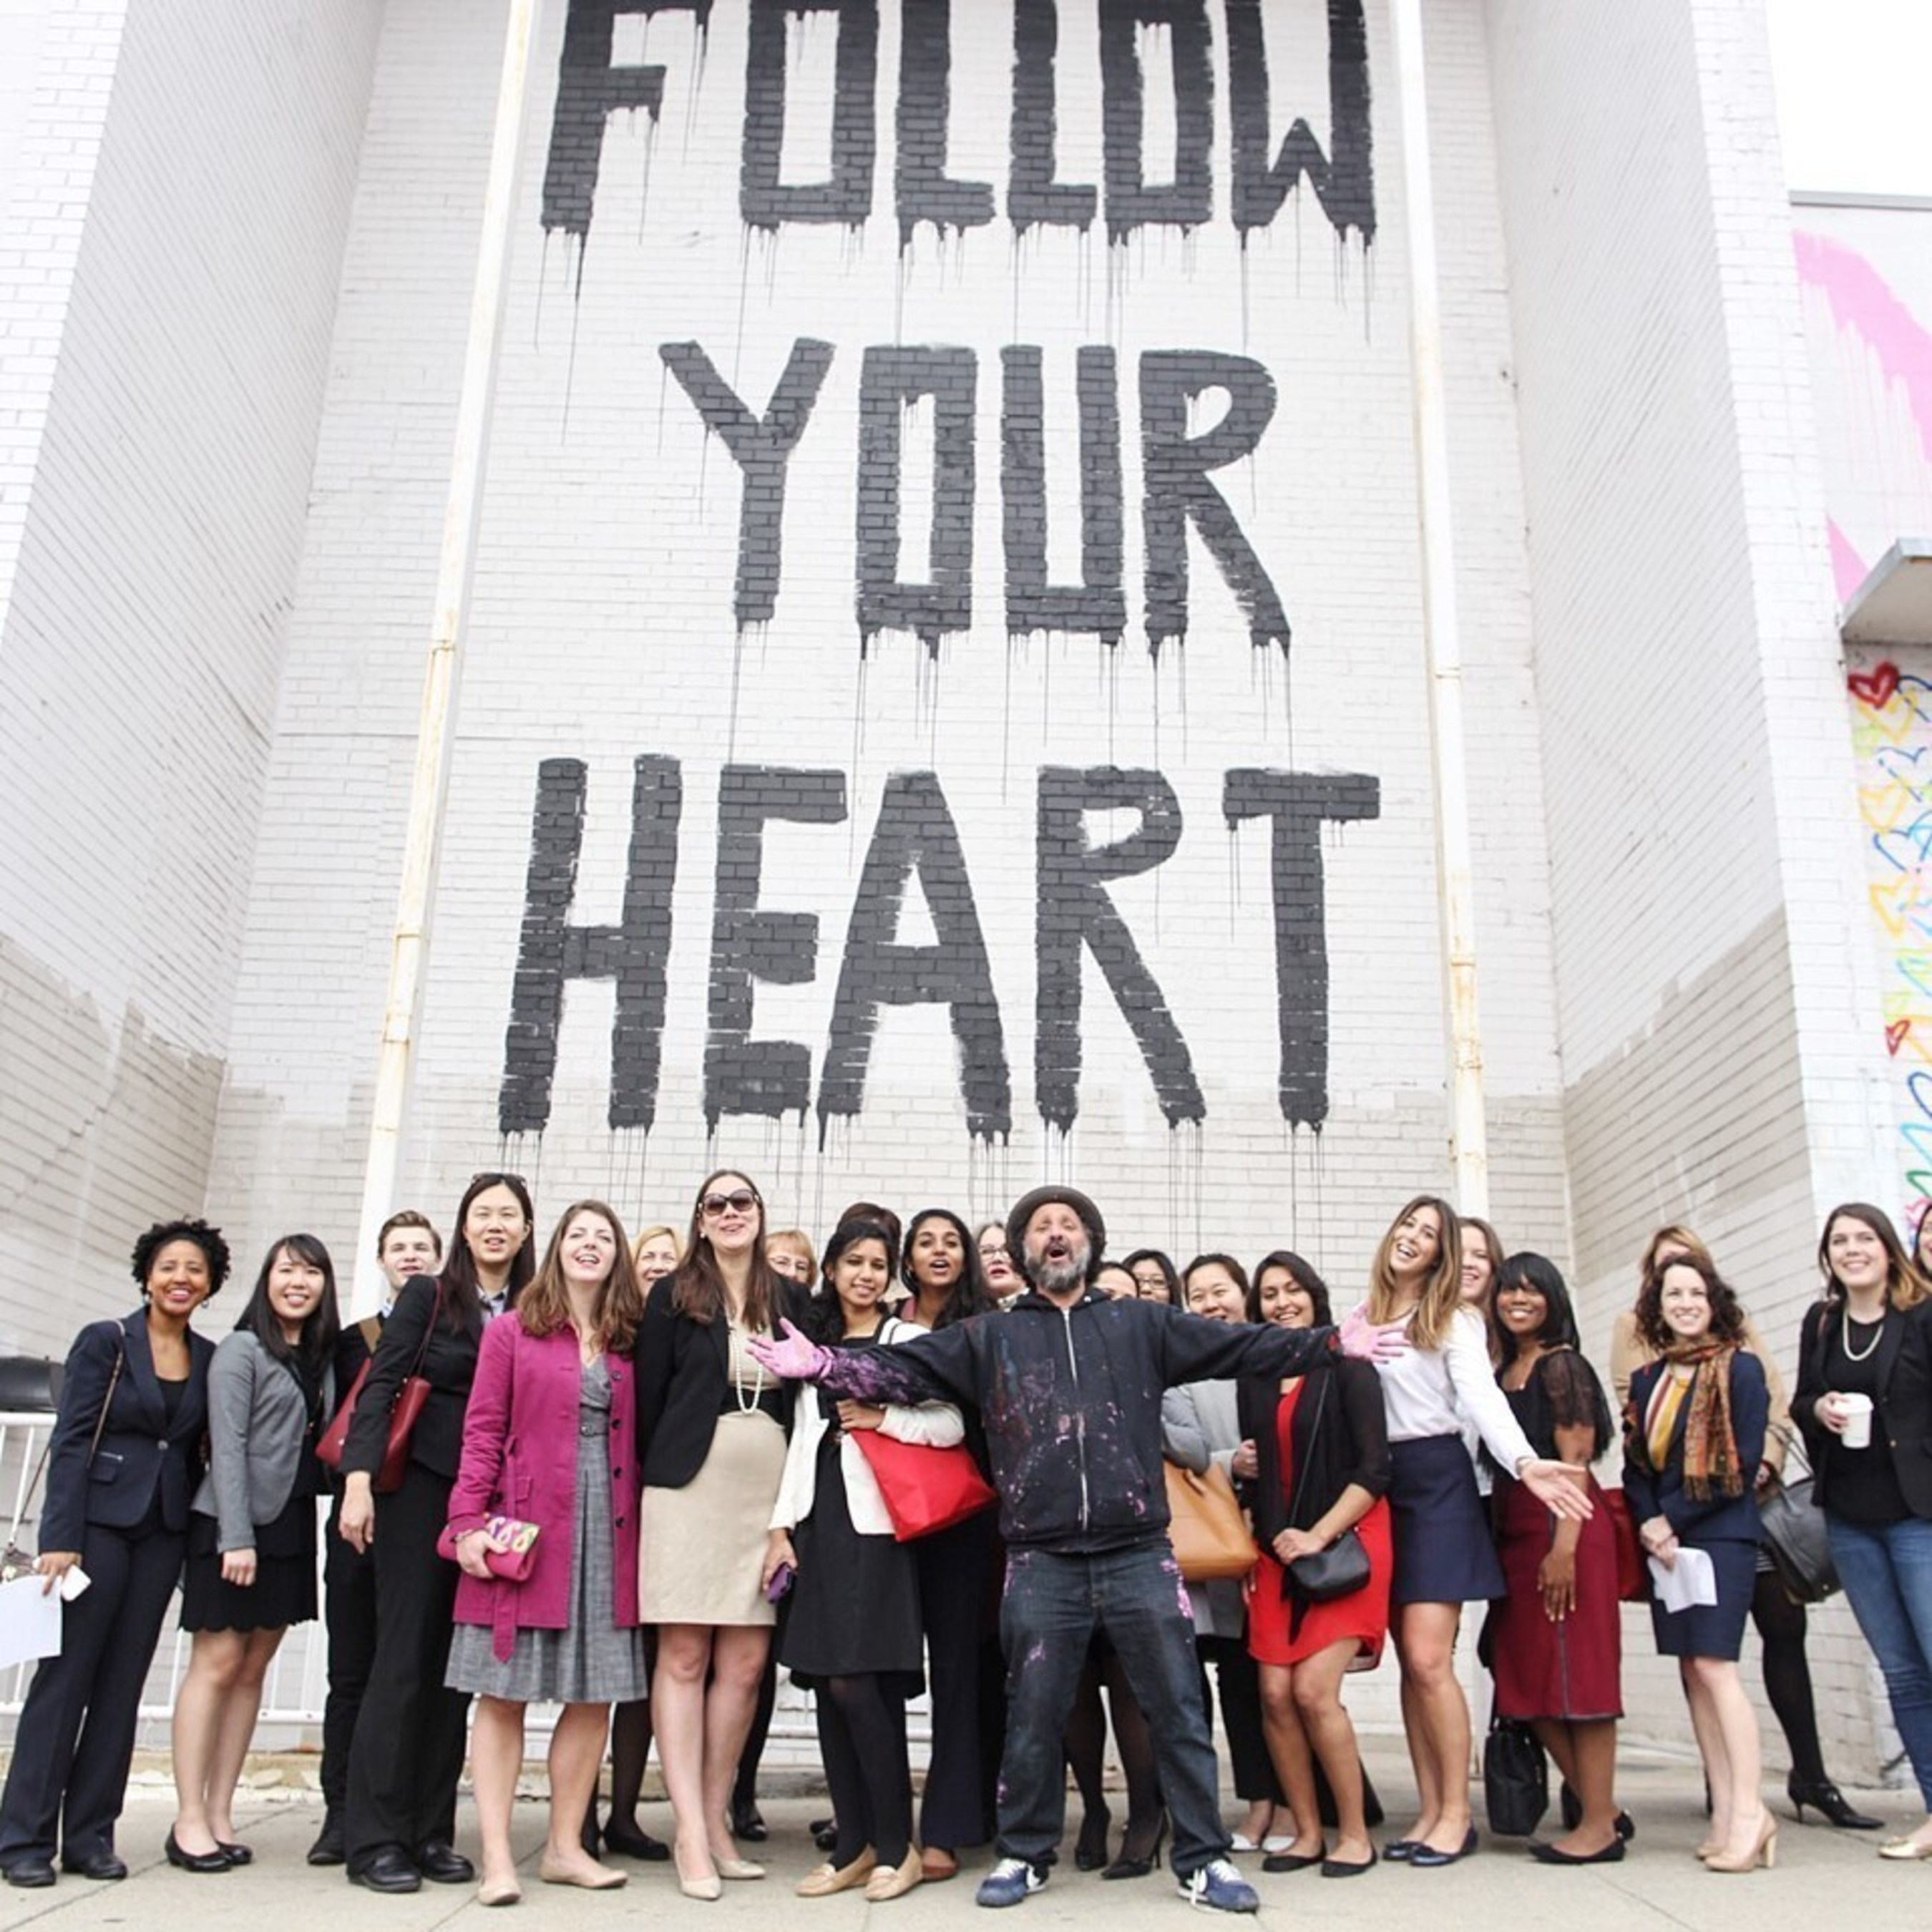 Union Market Celebrates International Women's Day with Michelle Obama and Street Artist Mr. Brainwash; Photo Credit: Gary Williams